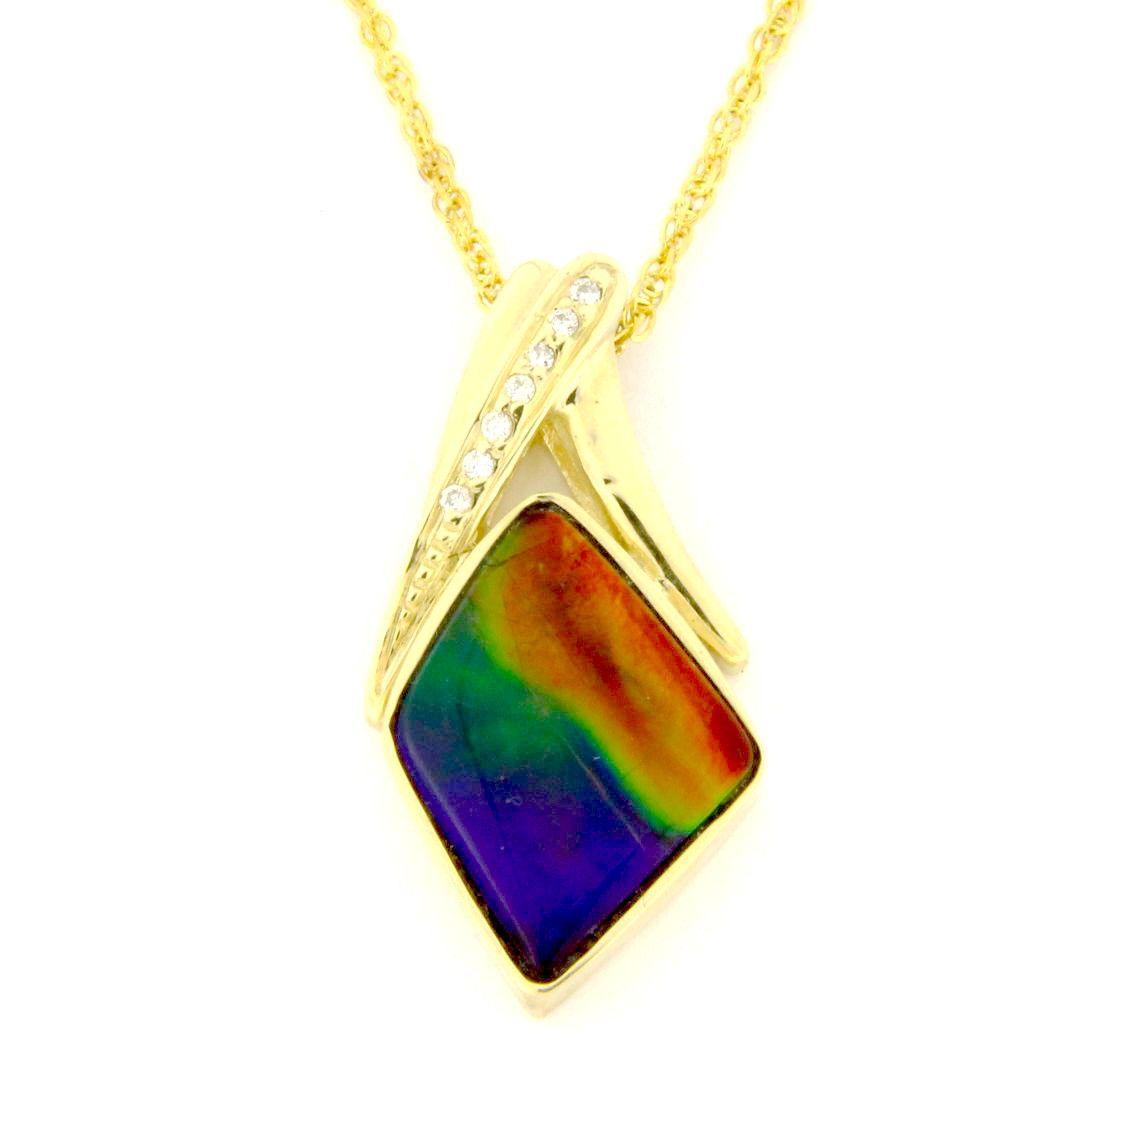 14kt gold ammolite pendant